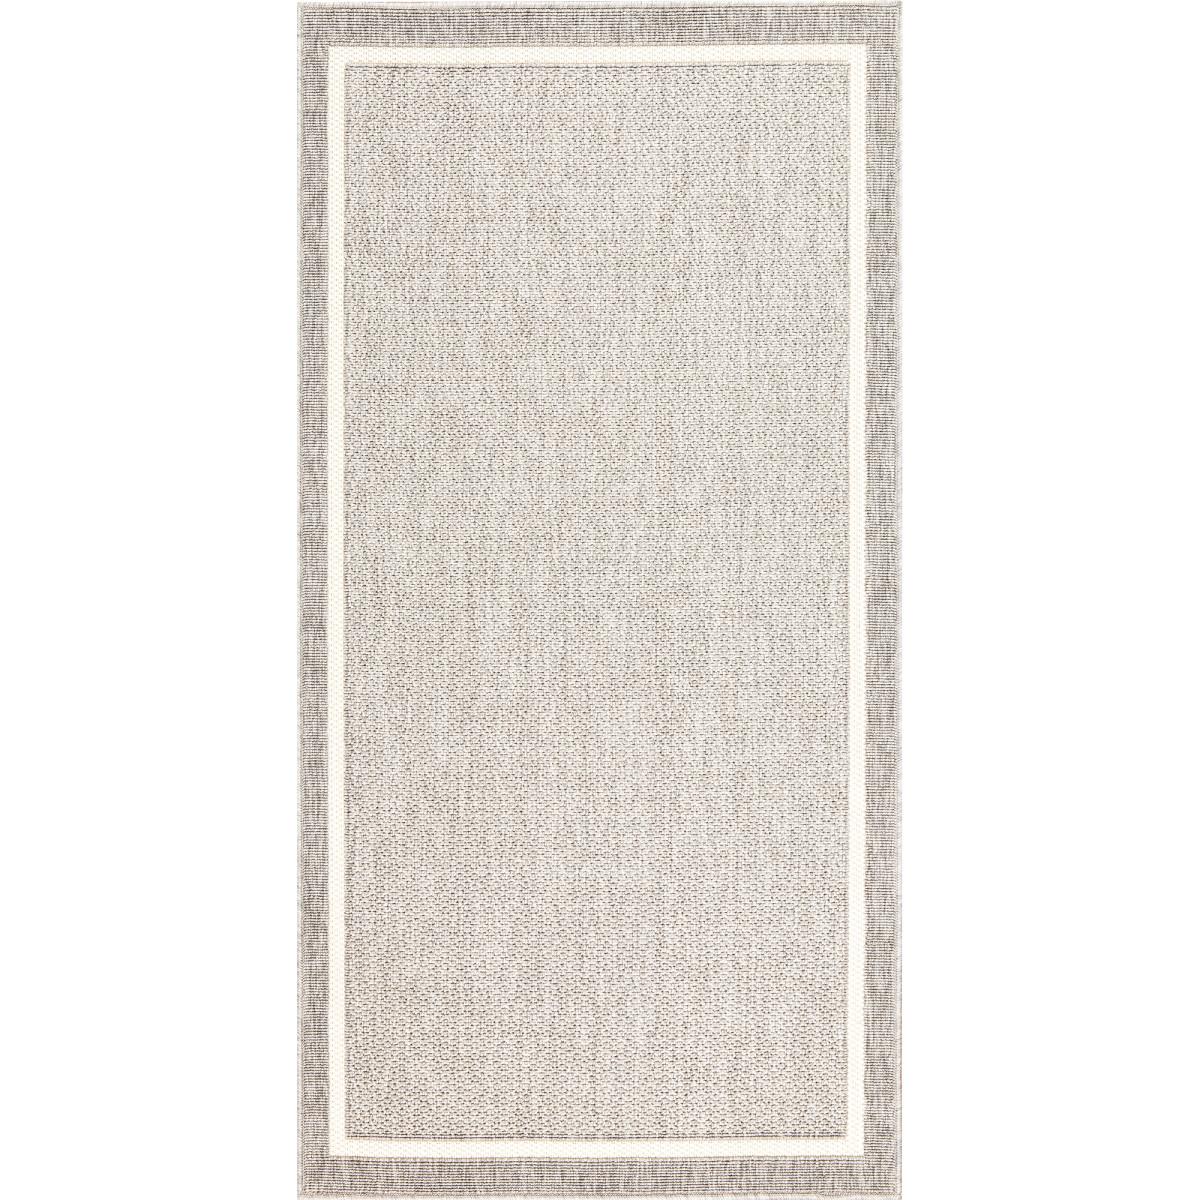 Ковёр Fenix 20427/332 0.8х1.5 м цвет серый